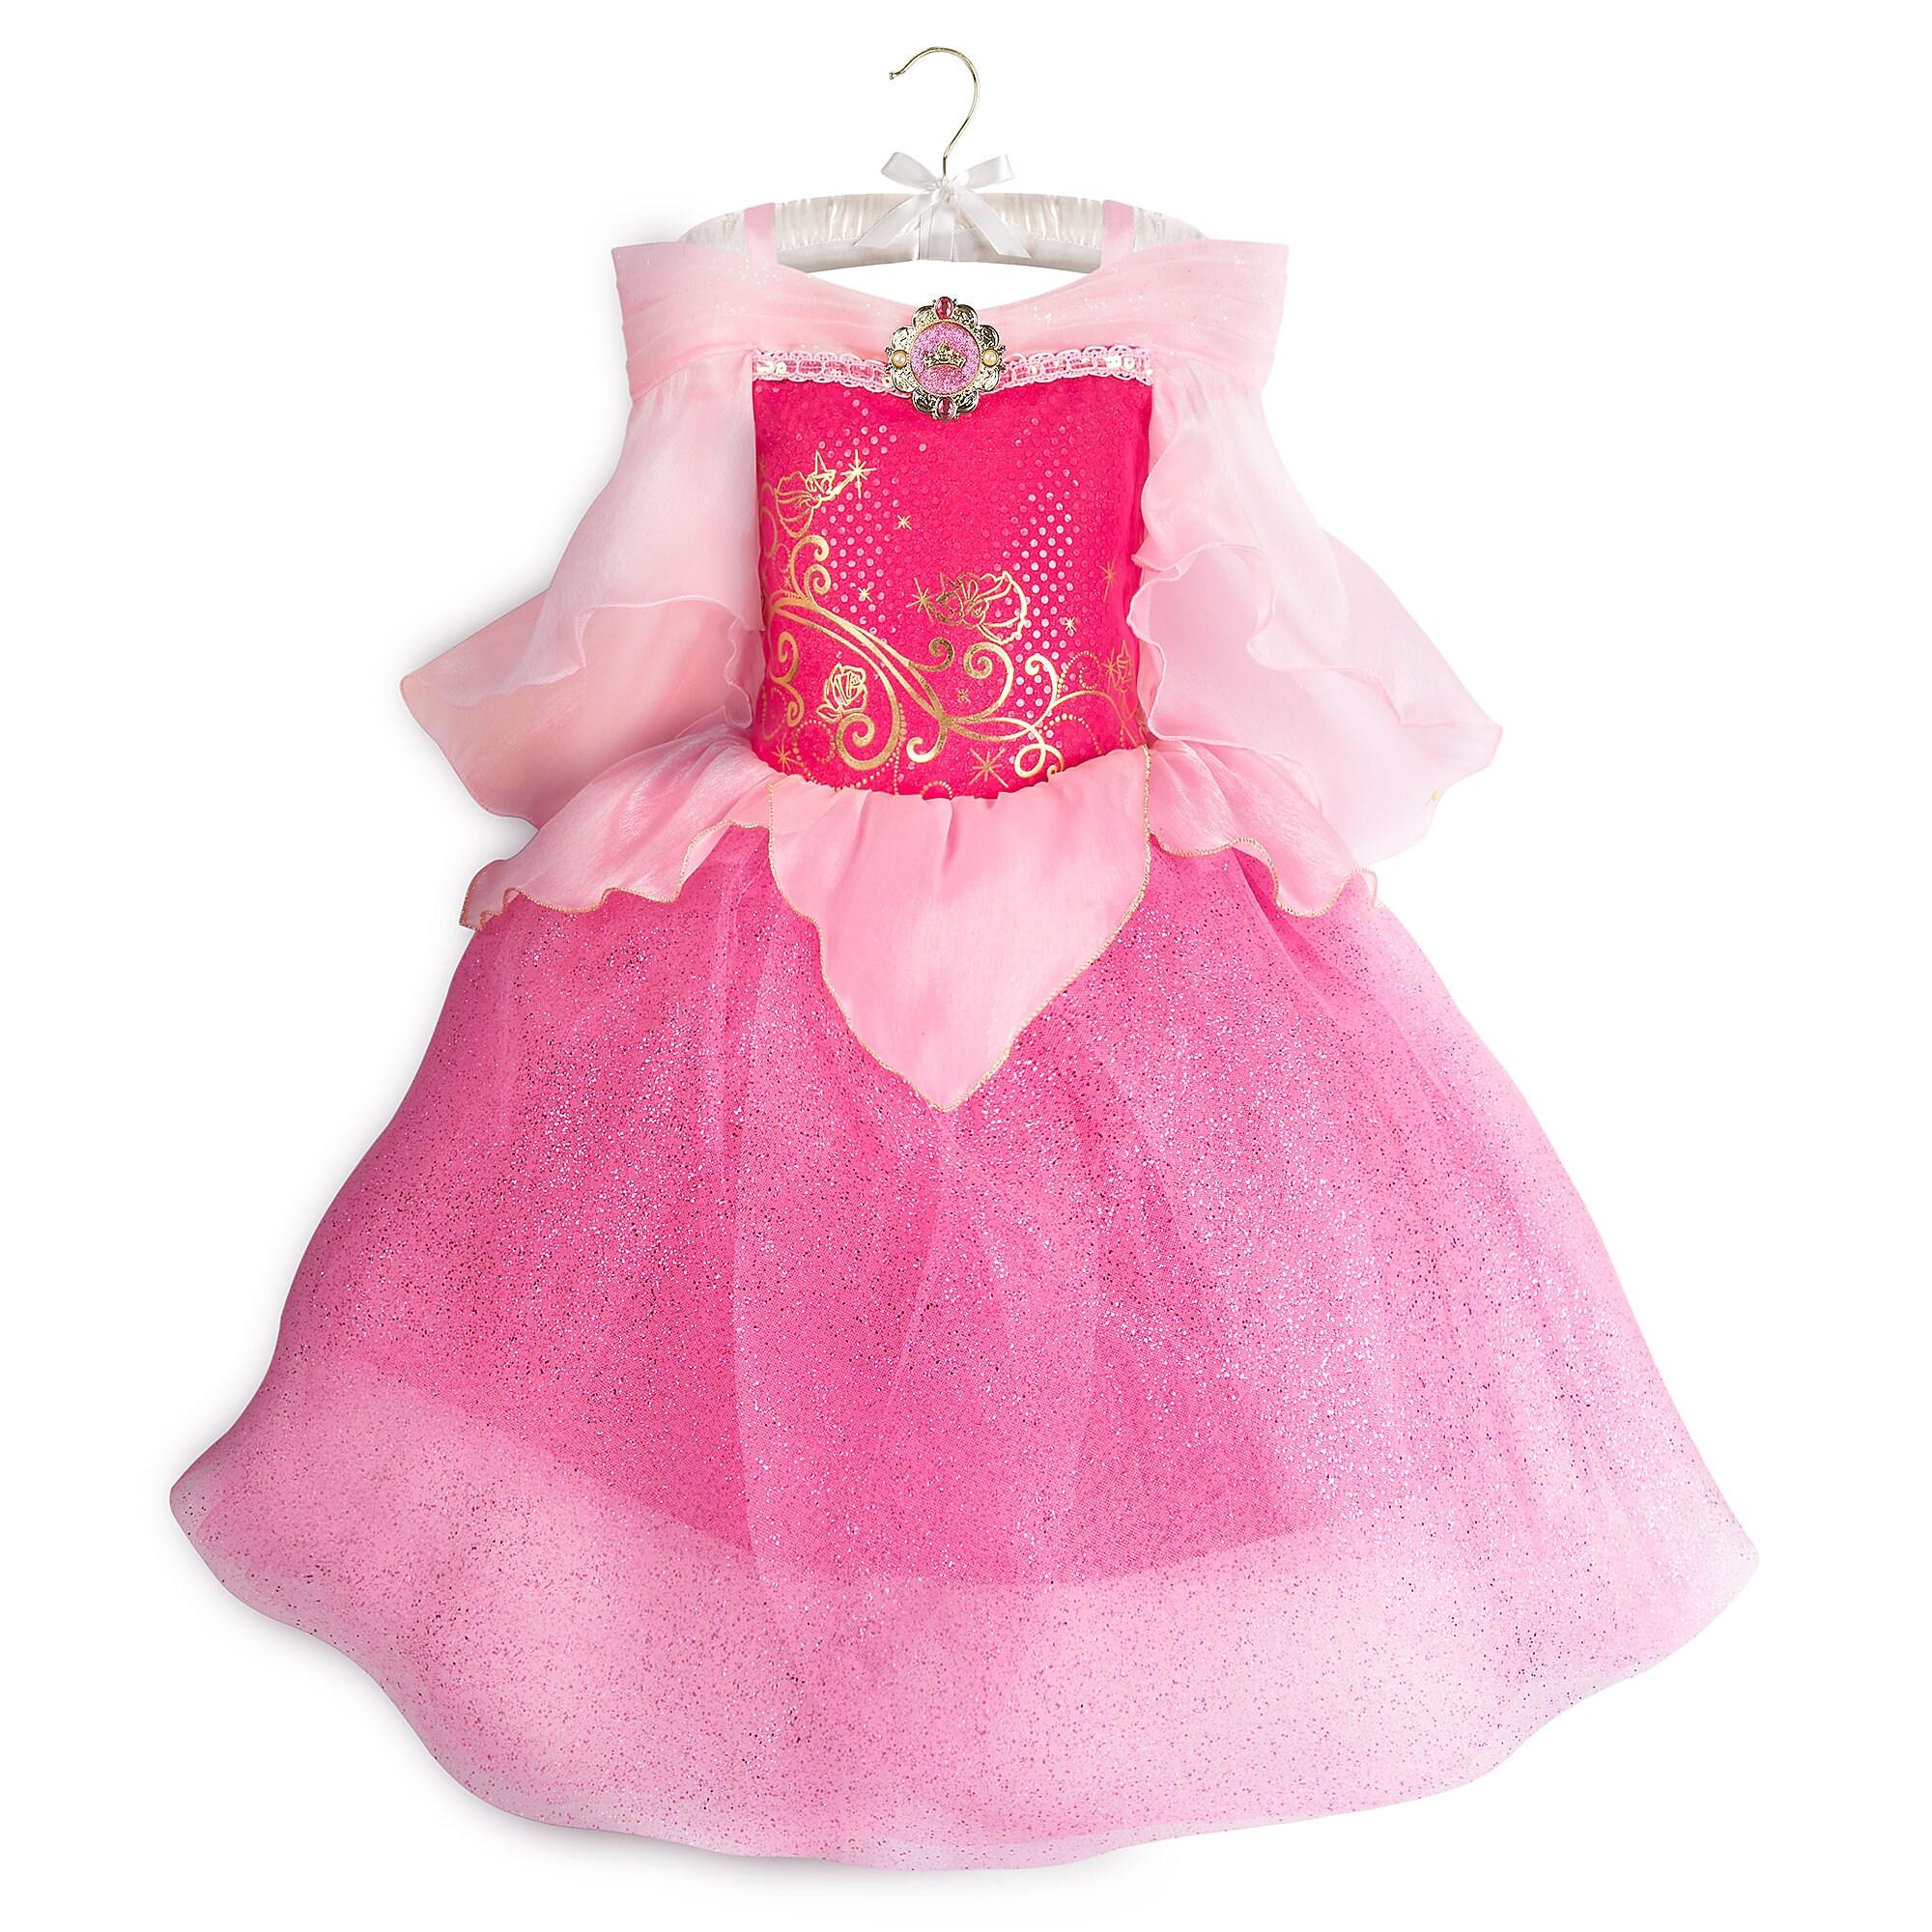 Aurora Costume for Kids - Sleeping Beauty | shopDisney